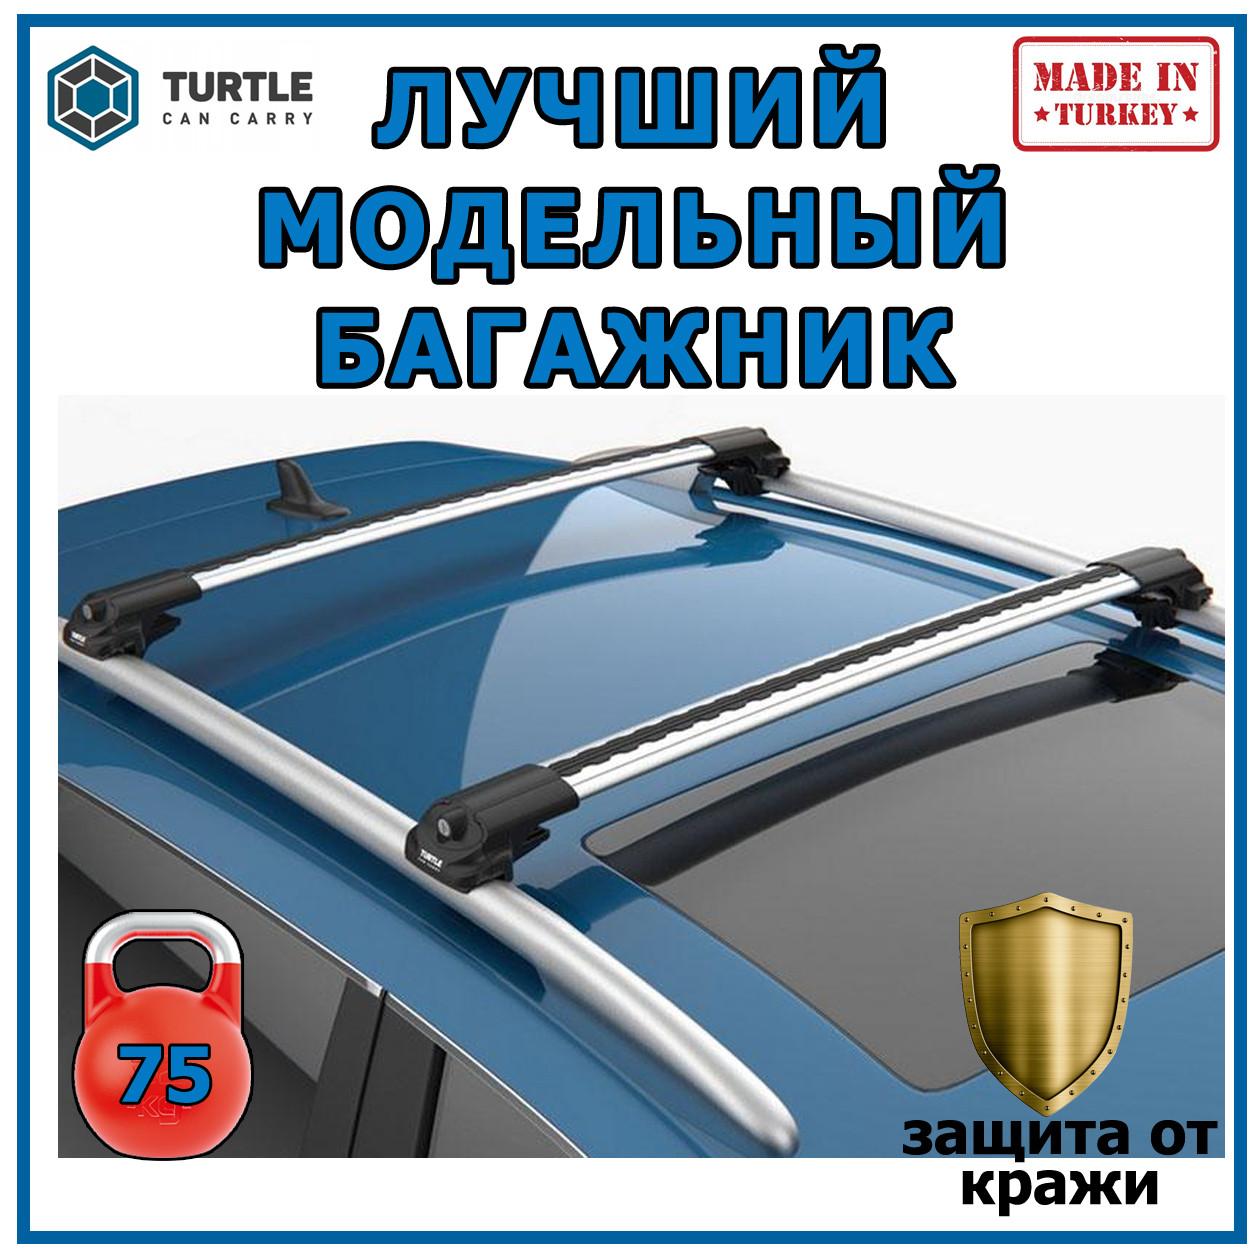 Багажник на дах Ford Grand 2011-2019 на рейлінги сірий Turtle